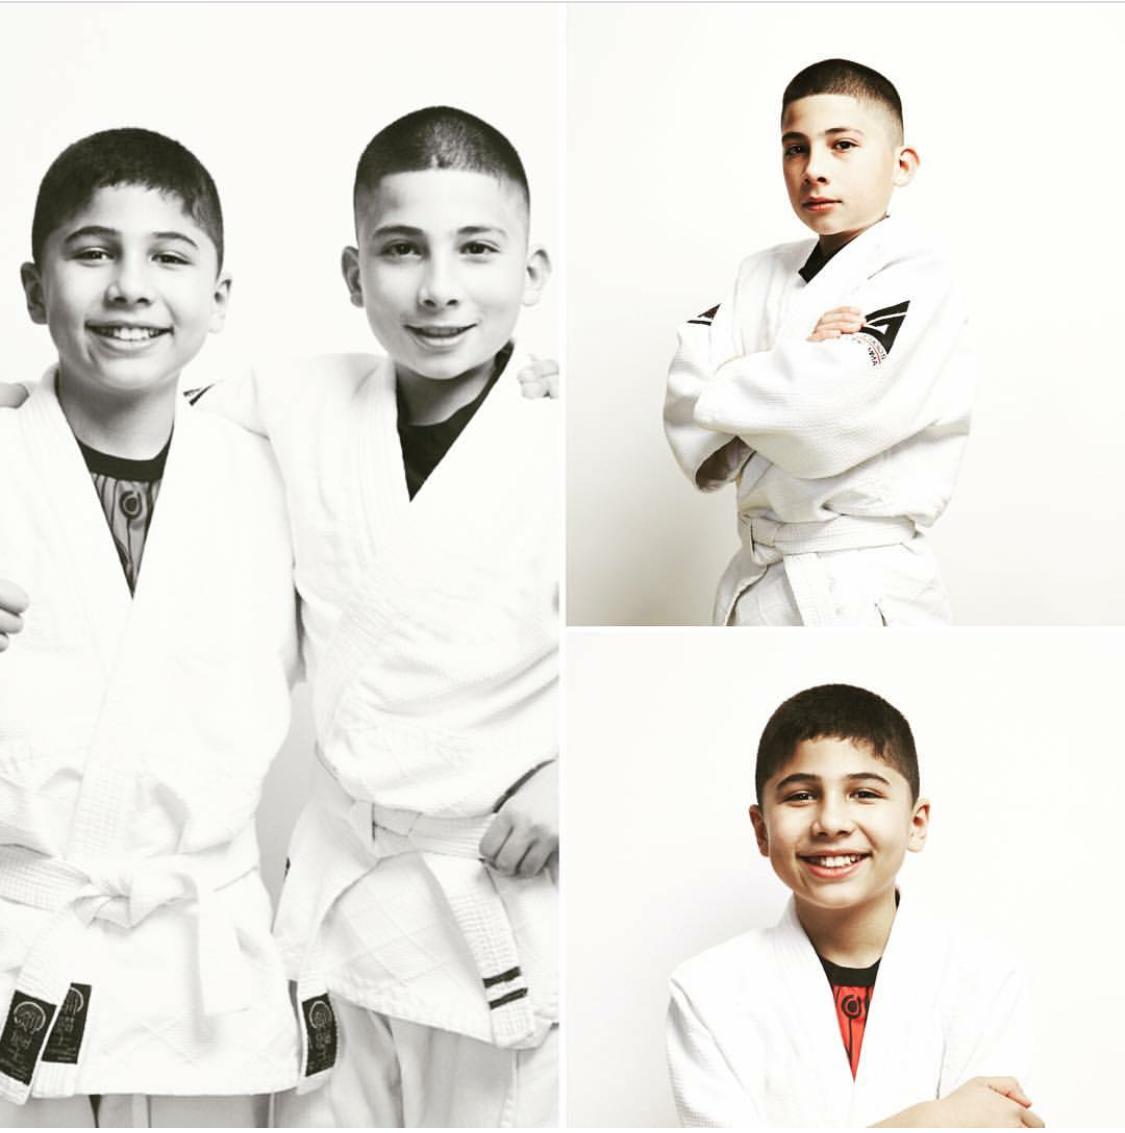 Youth Jiu Jitsu program       Building confidence and leadership